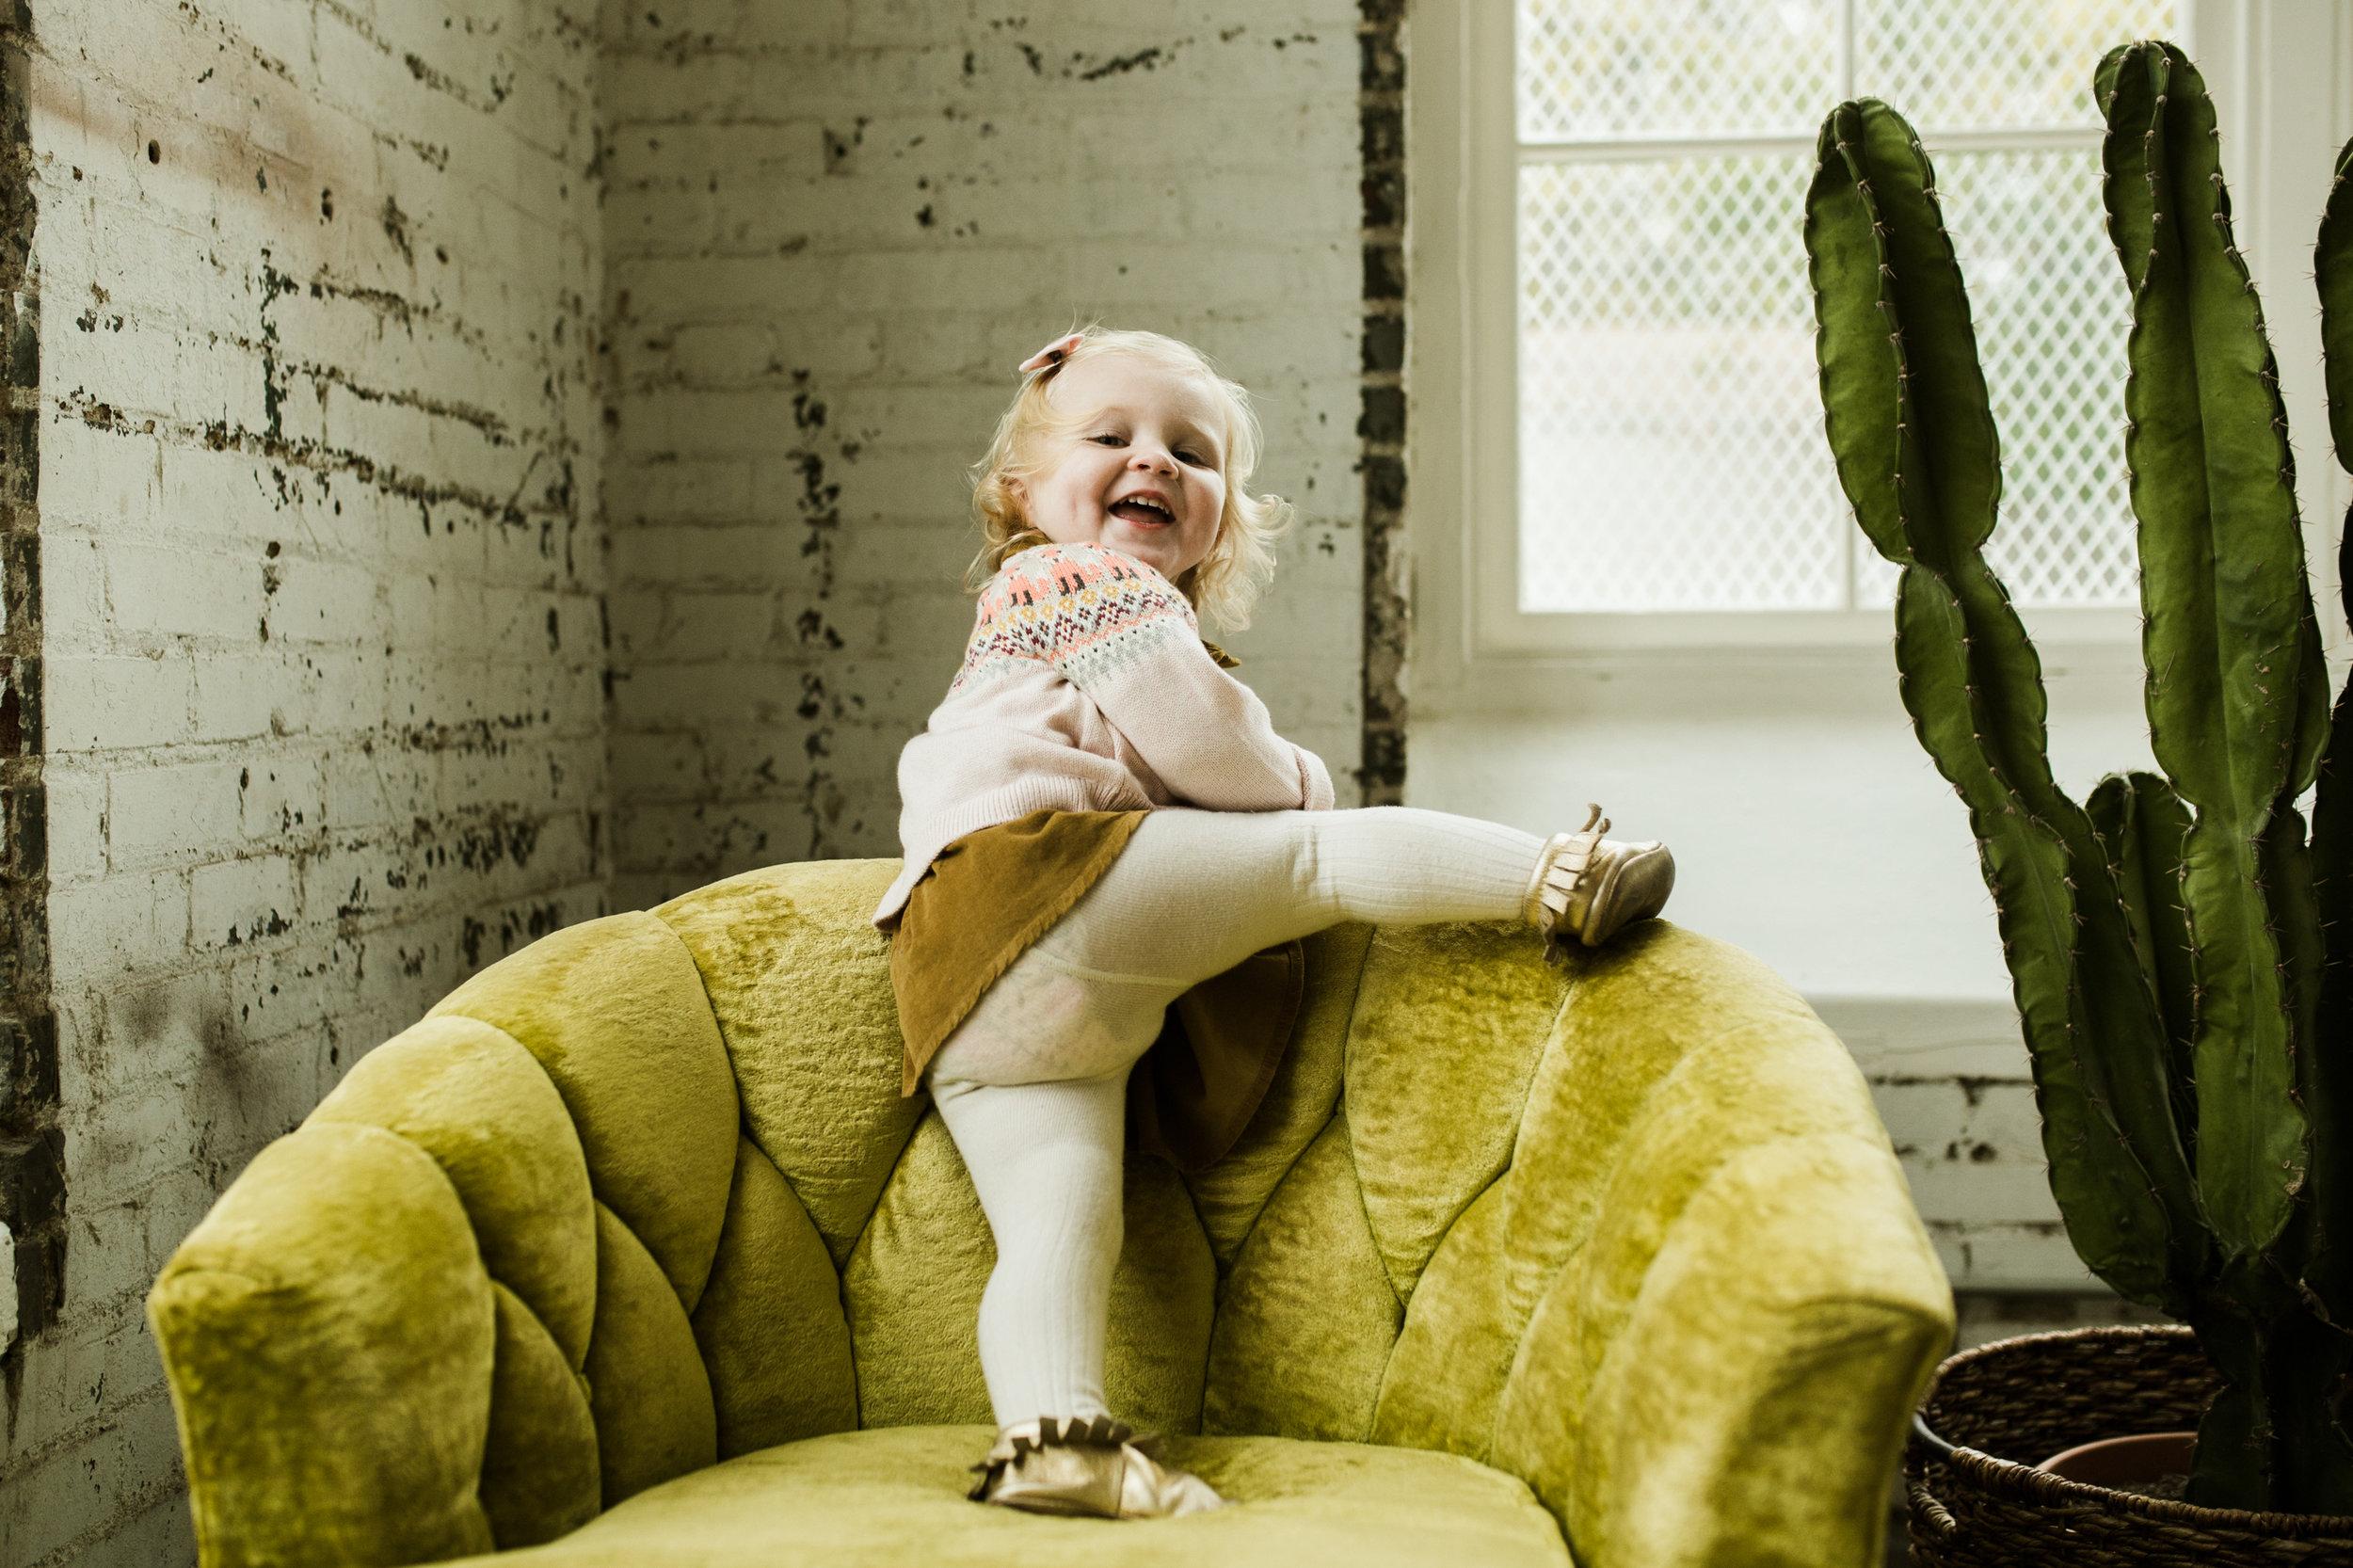 Neely Key LeMay Fall 2017 WEBSITE Crystal Ludwick Photo (43 of 60).jpg